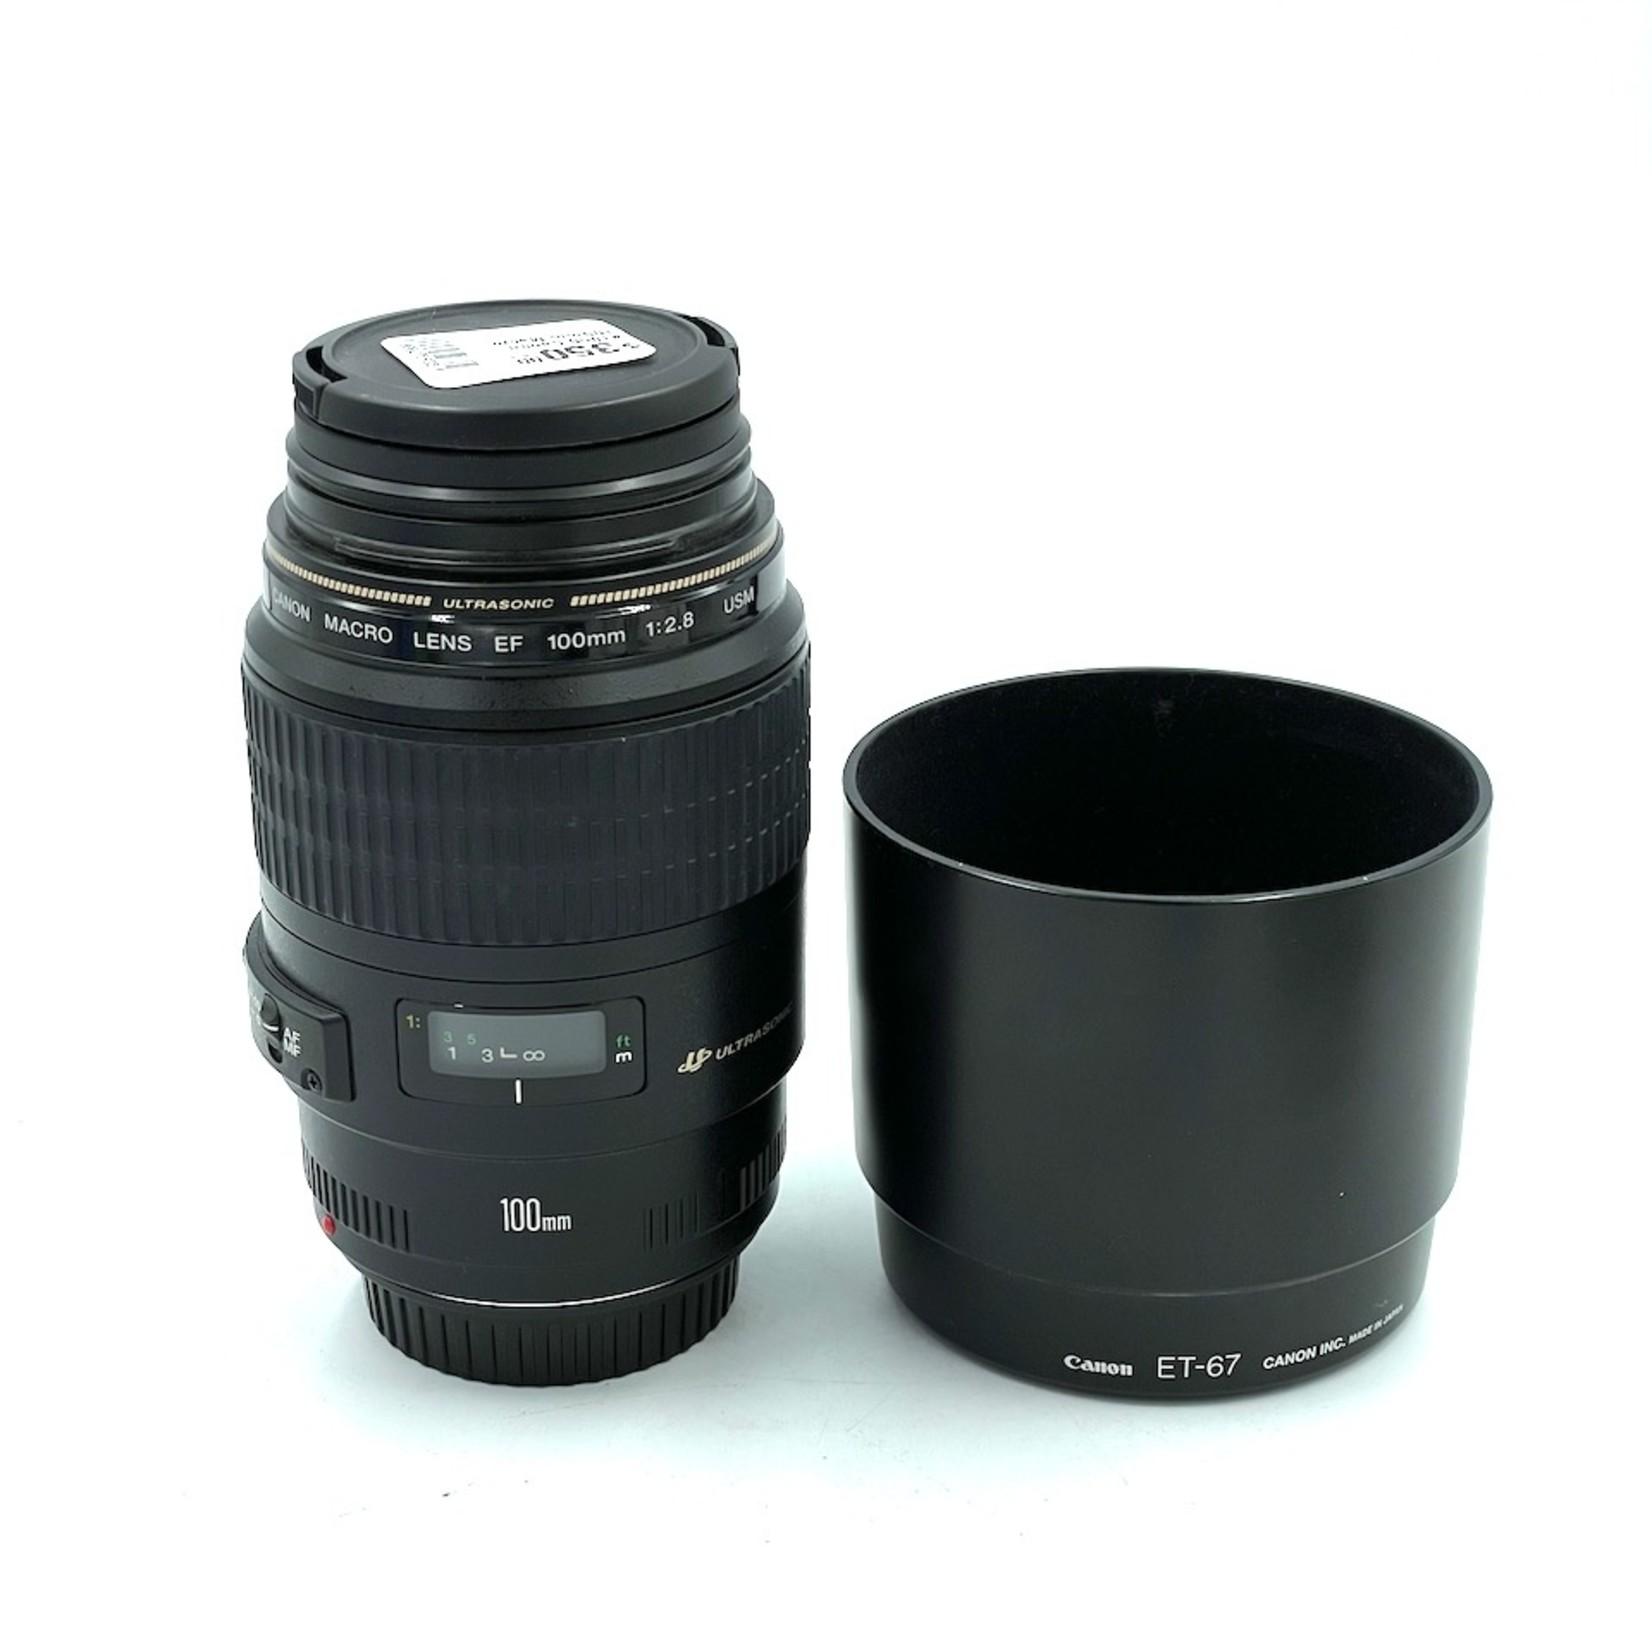 Canon #1056 Canon 100mm Macro